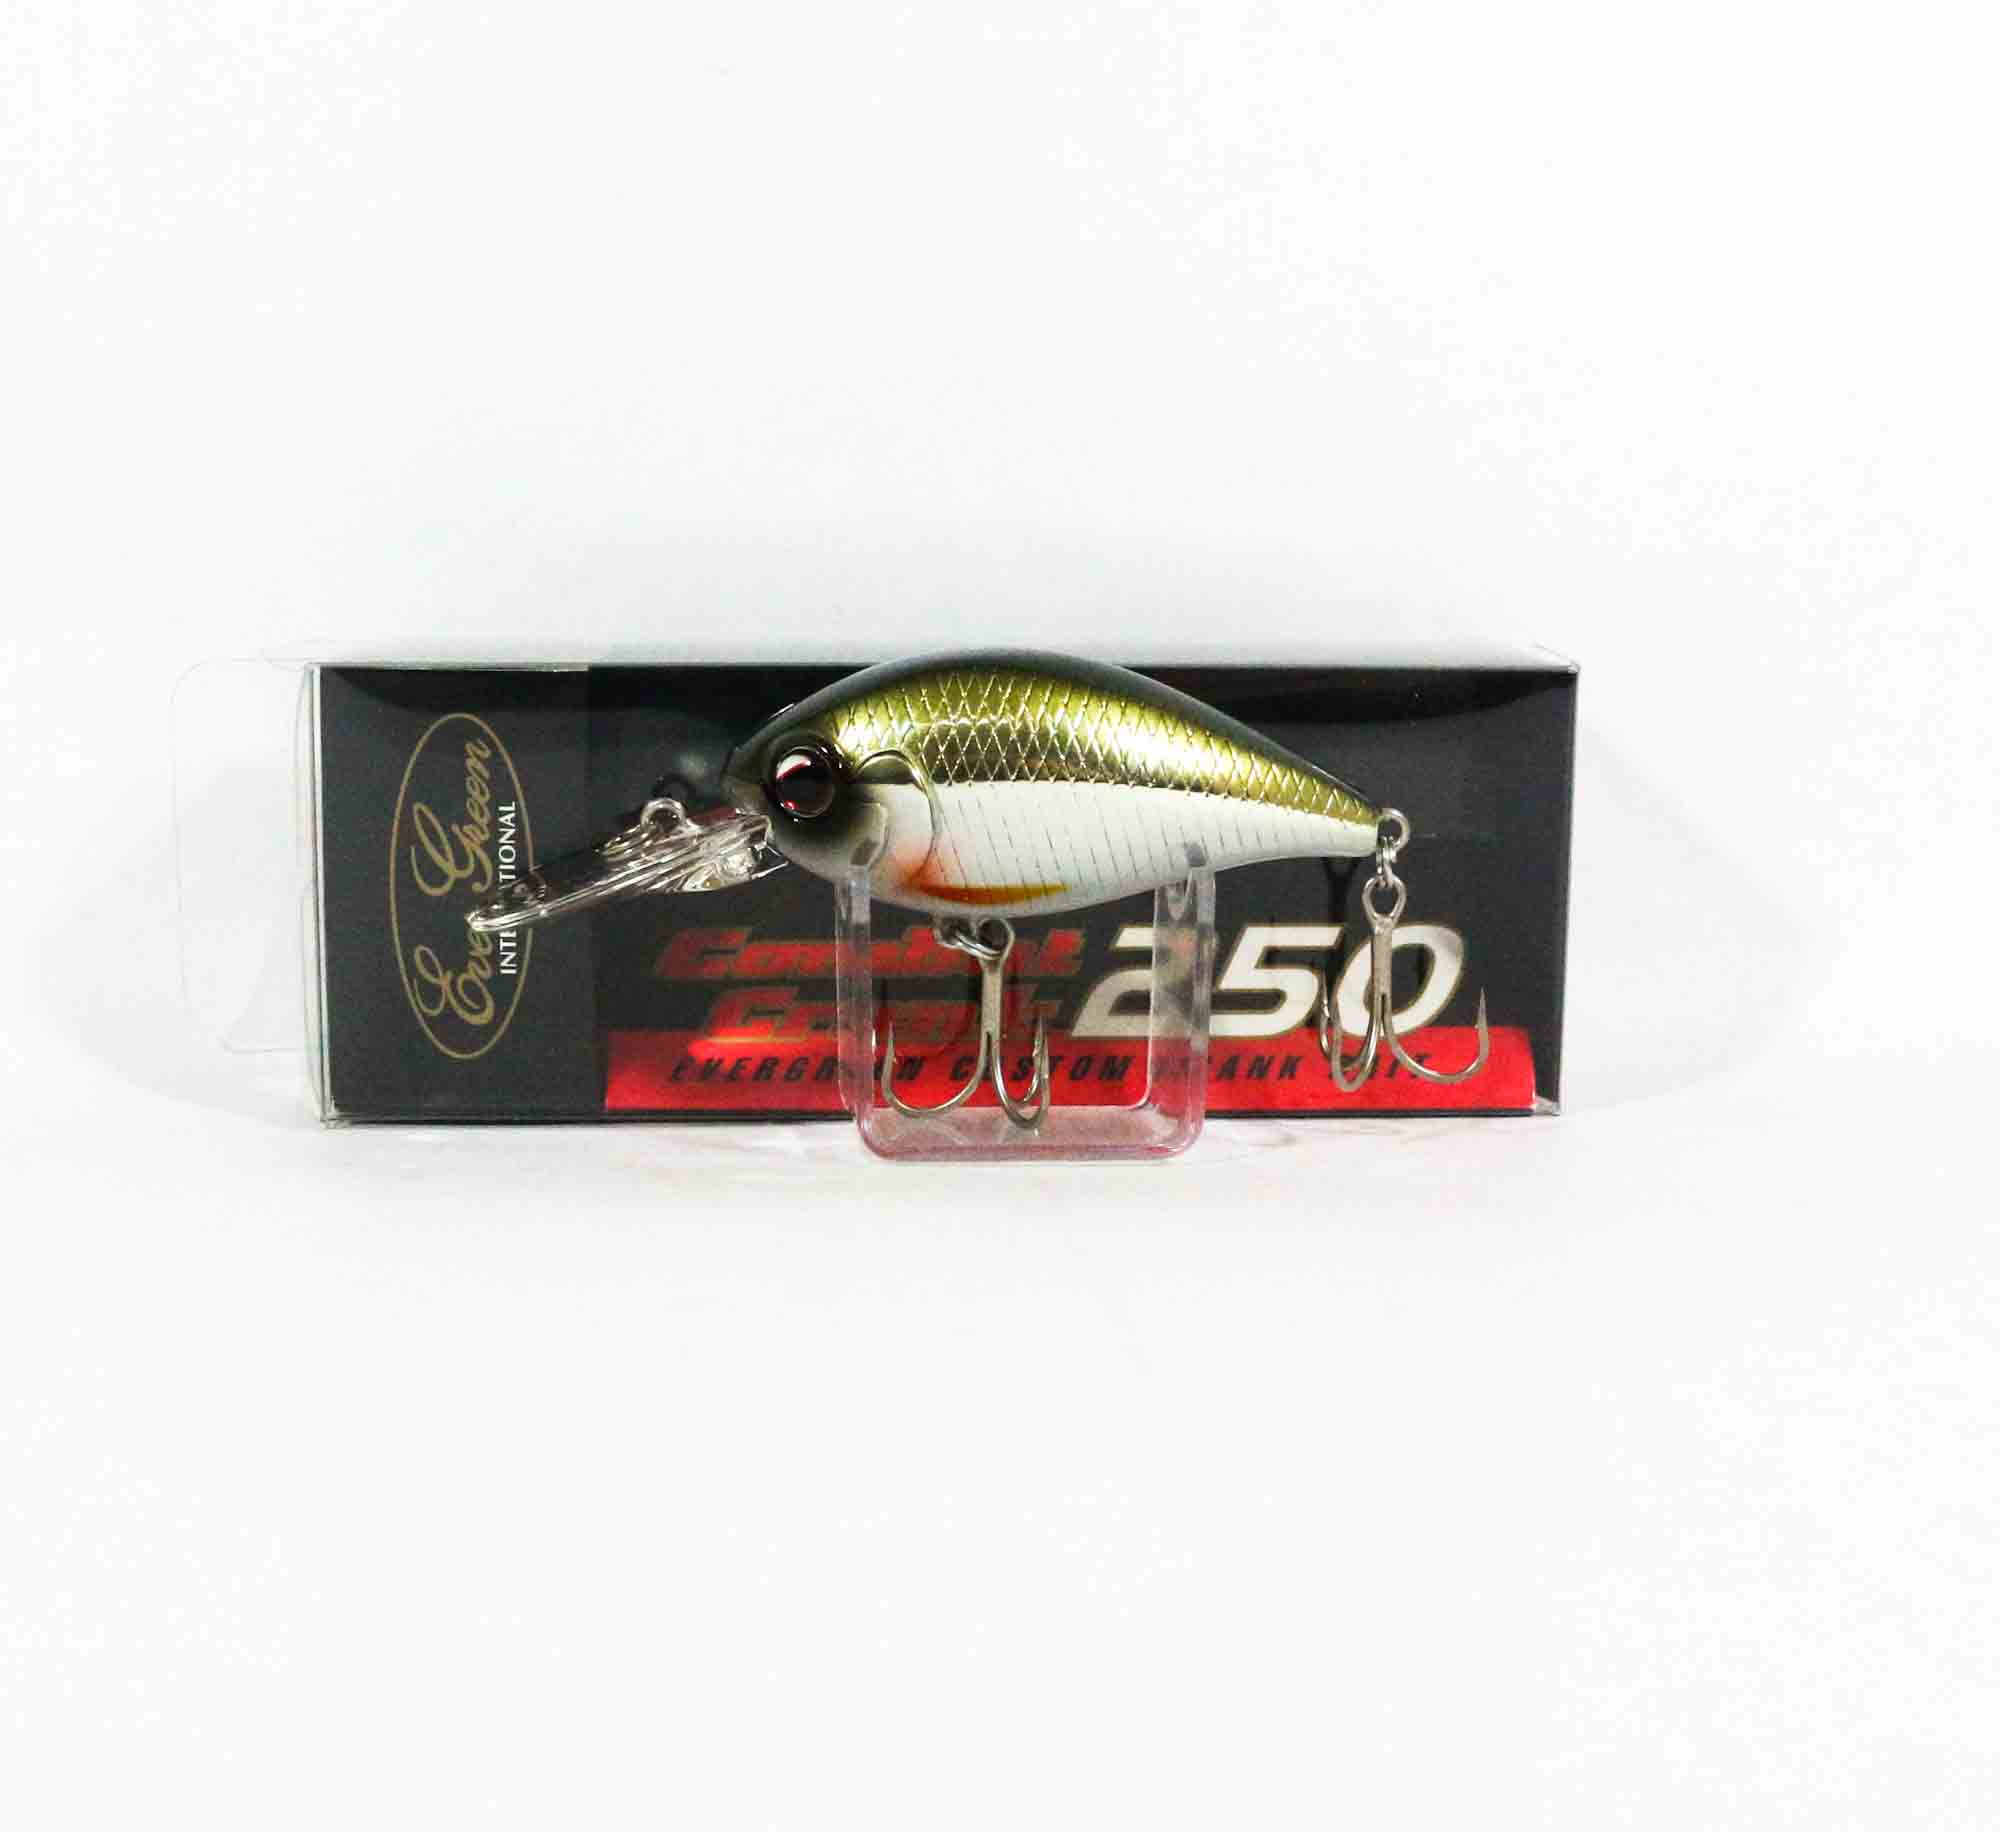 Evergreen Combat Crank 250 Floating Lure #360 (7700)